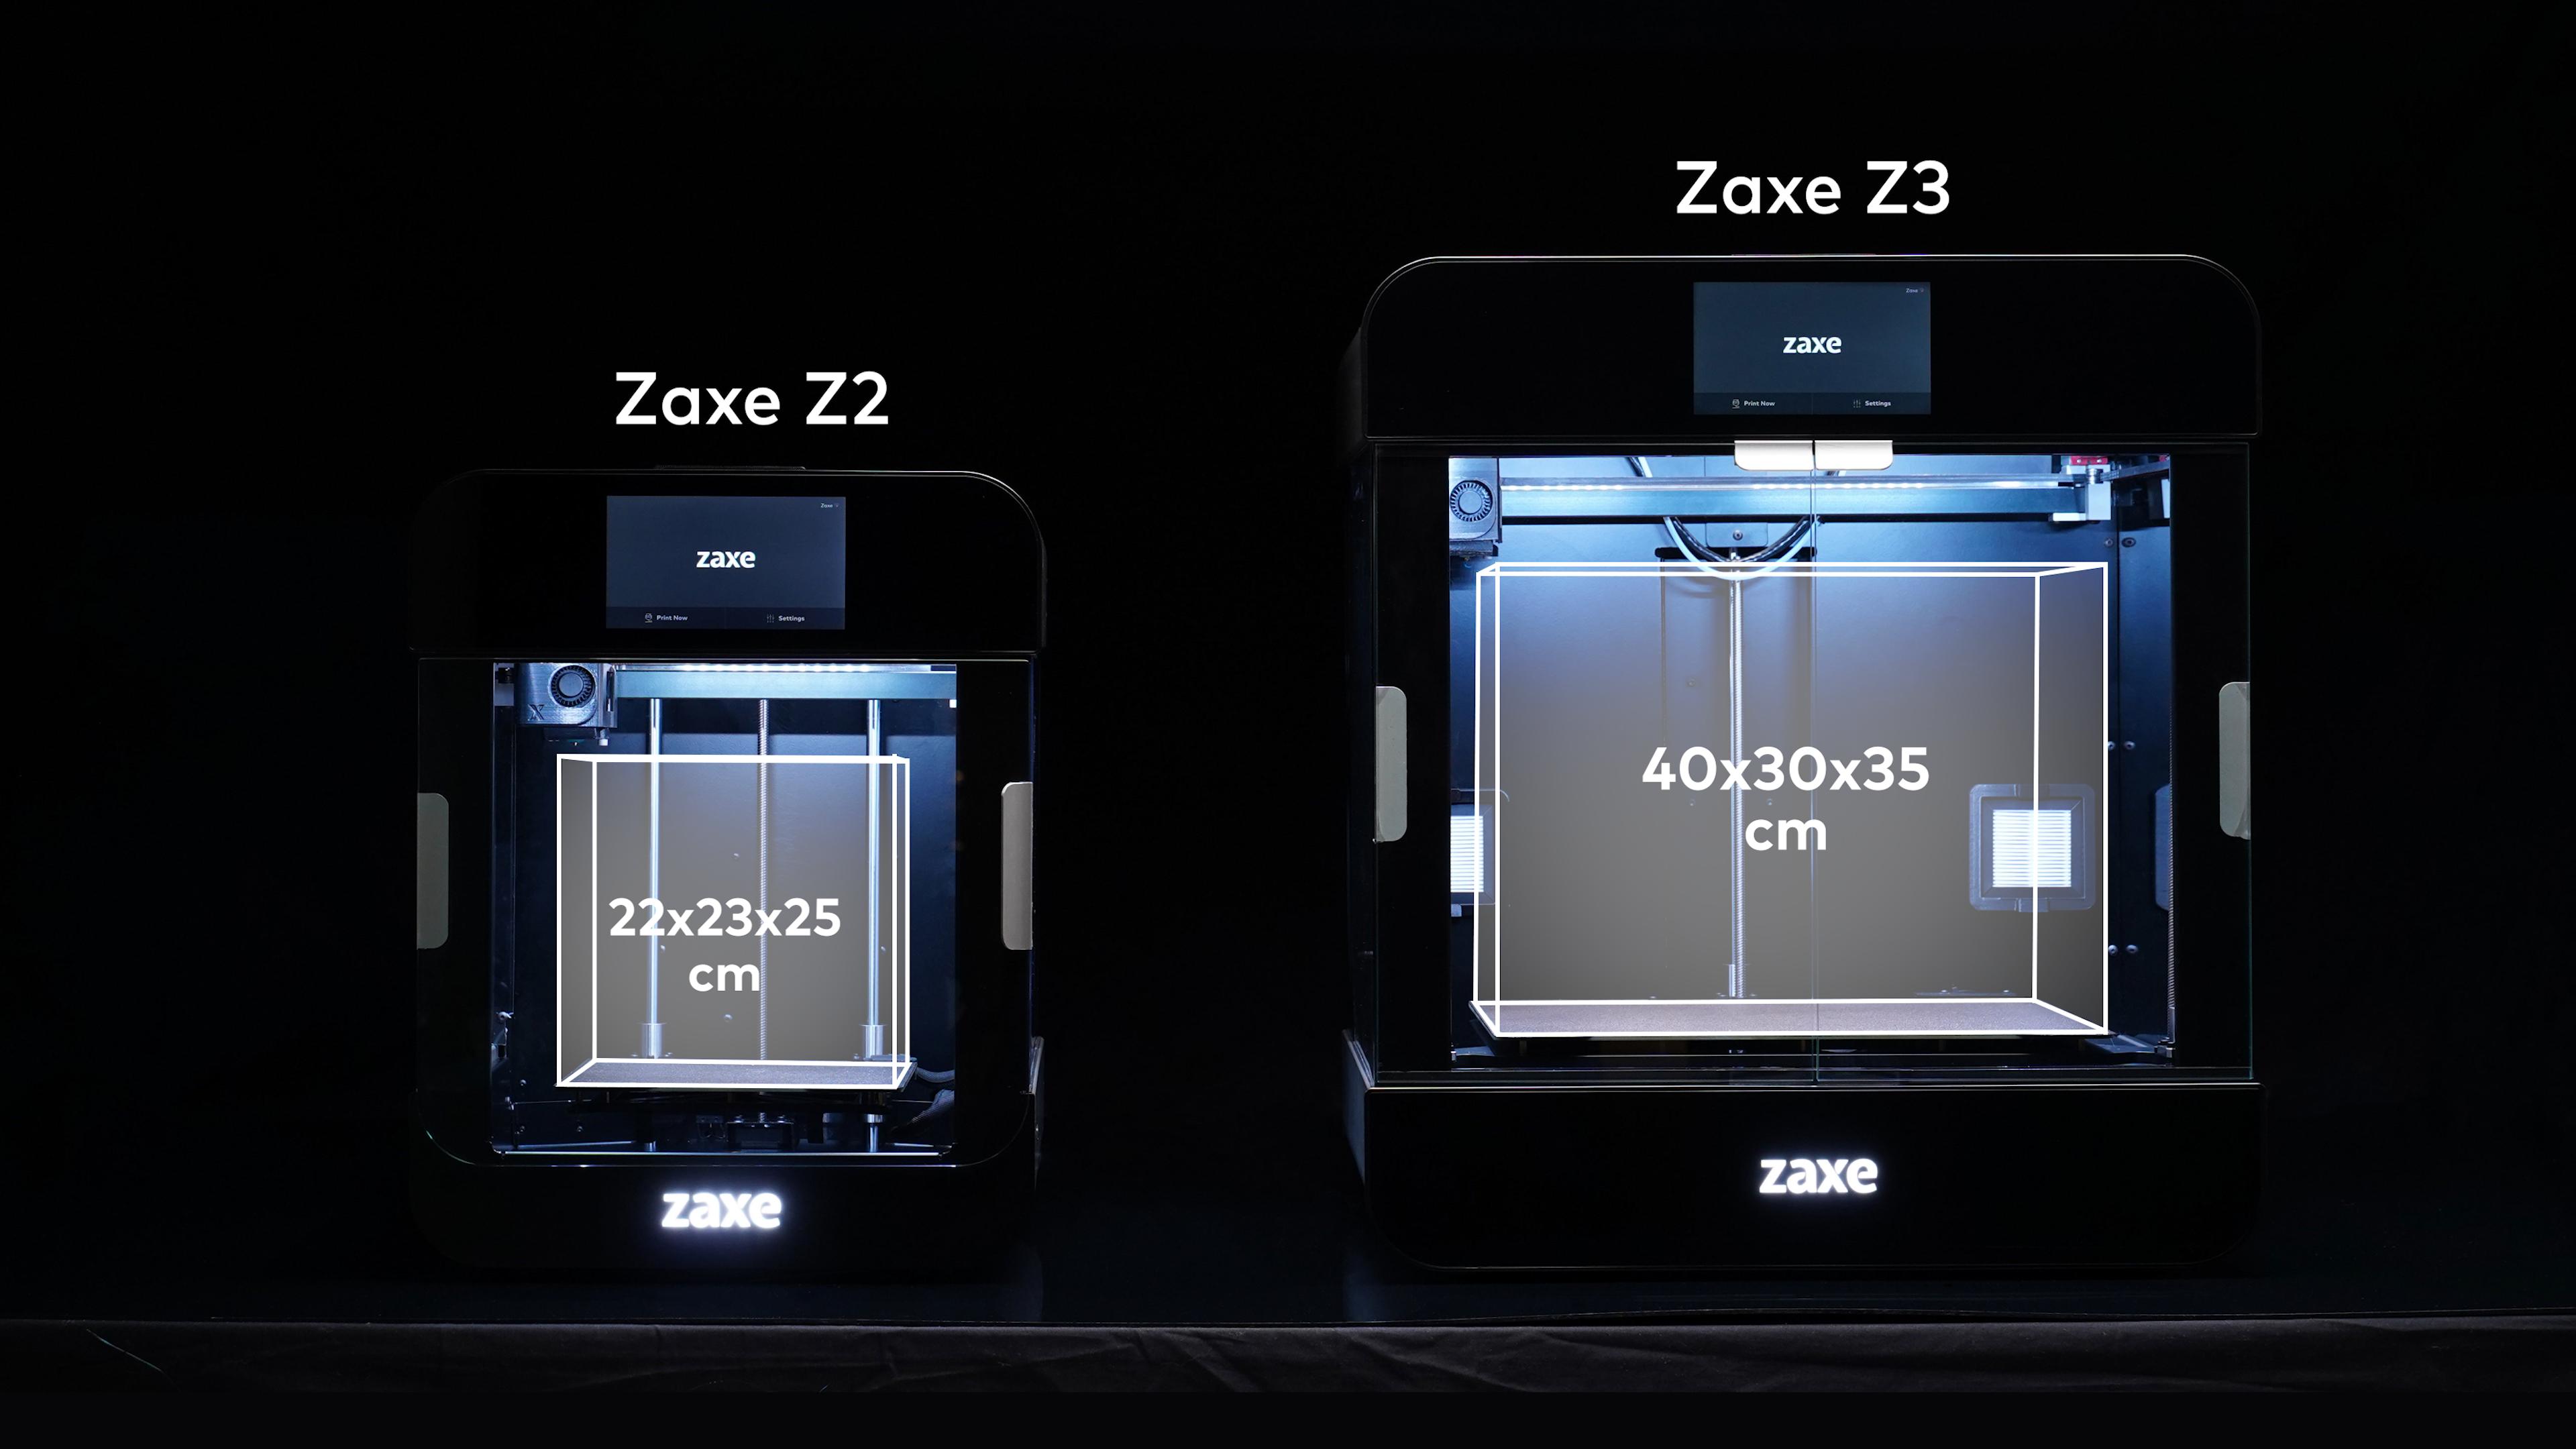 The Zaxe Z2 and the larger volume Z3 3D printers. Image via Zaxe.